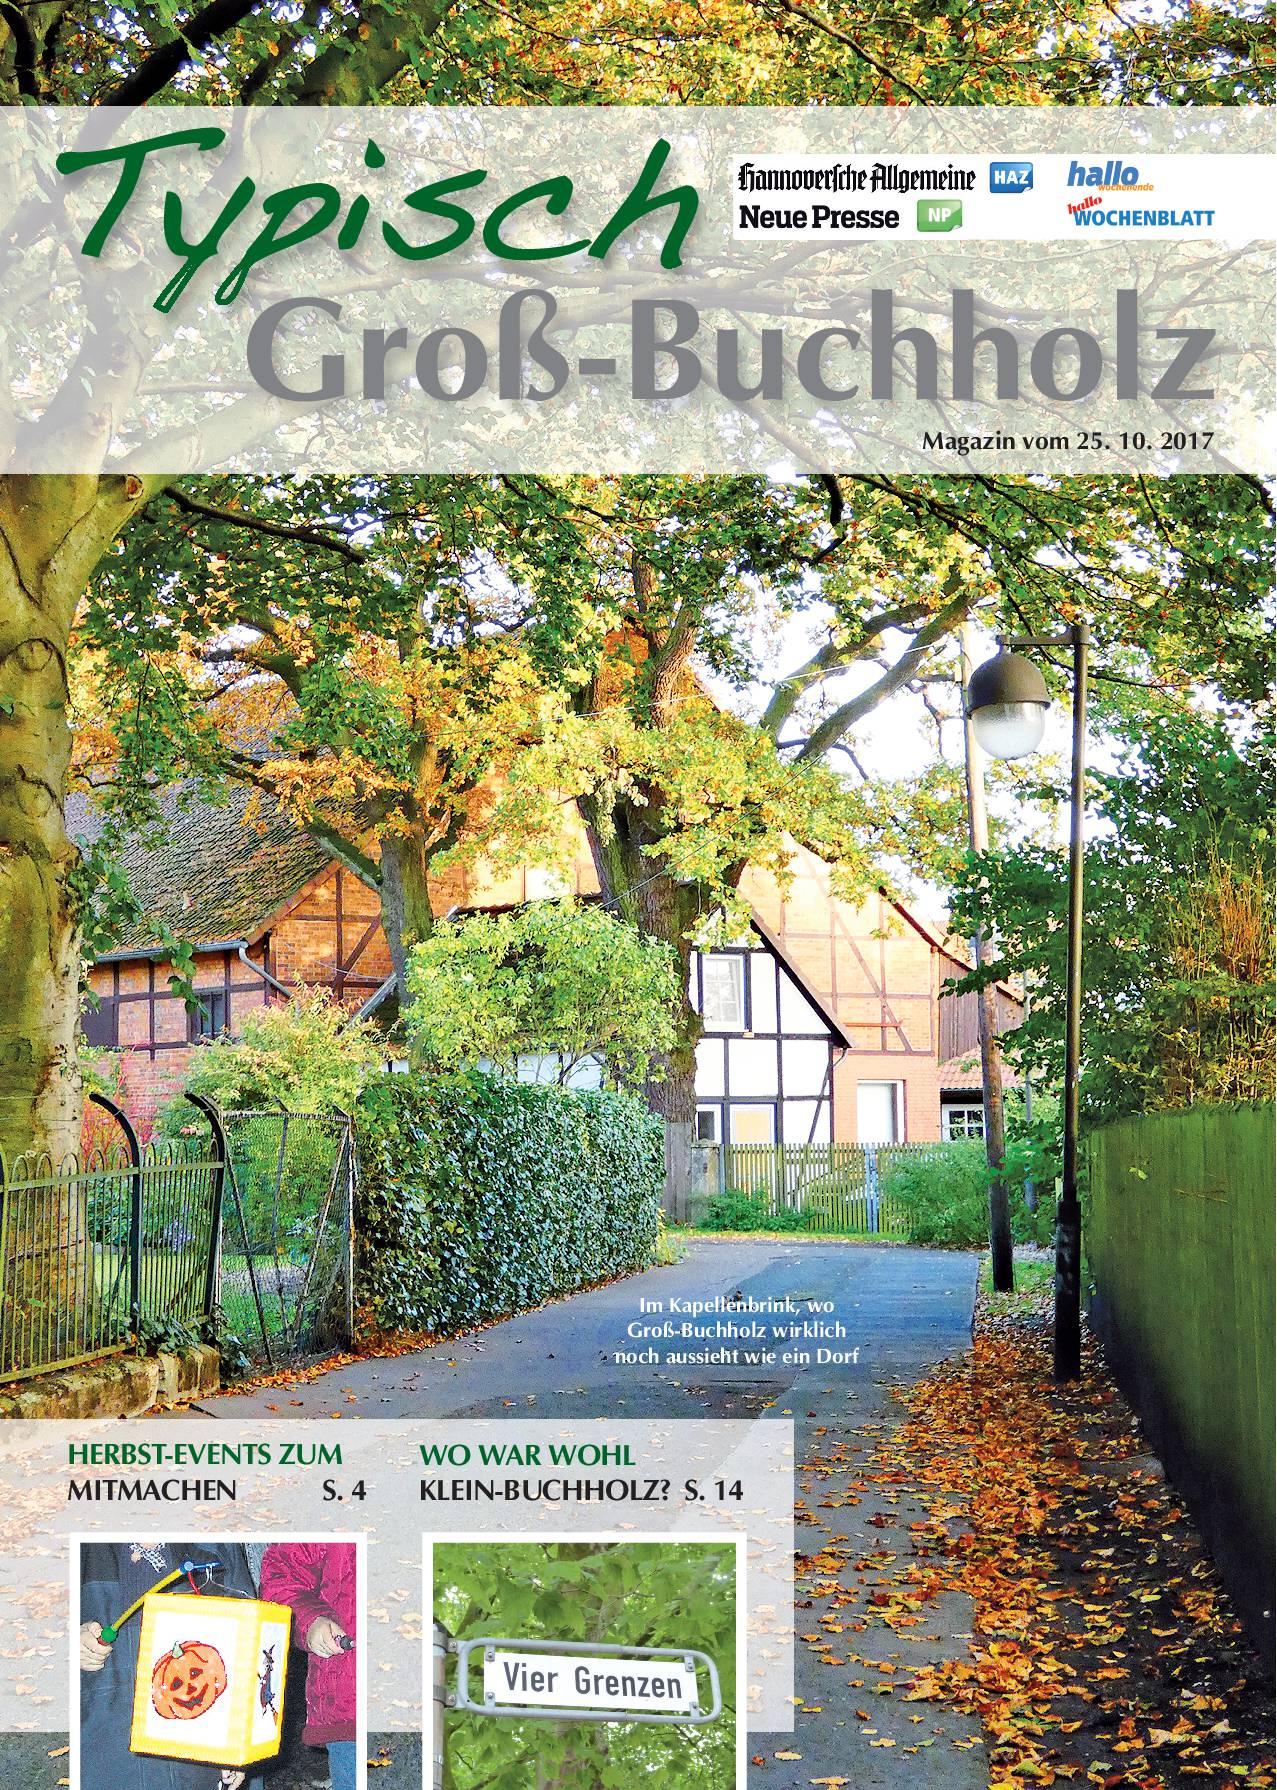 gross-buchholz-nr-3-vom-25-10-2017